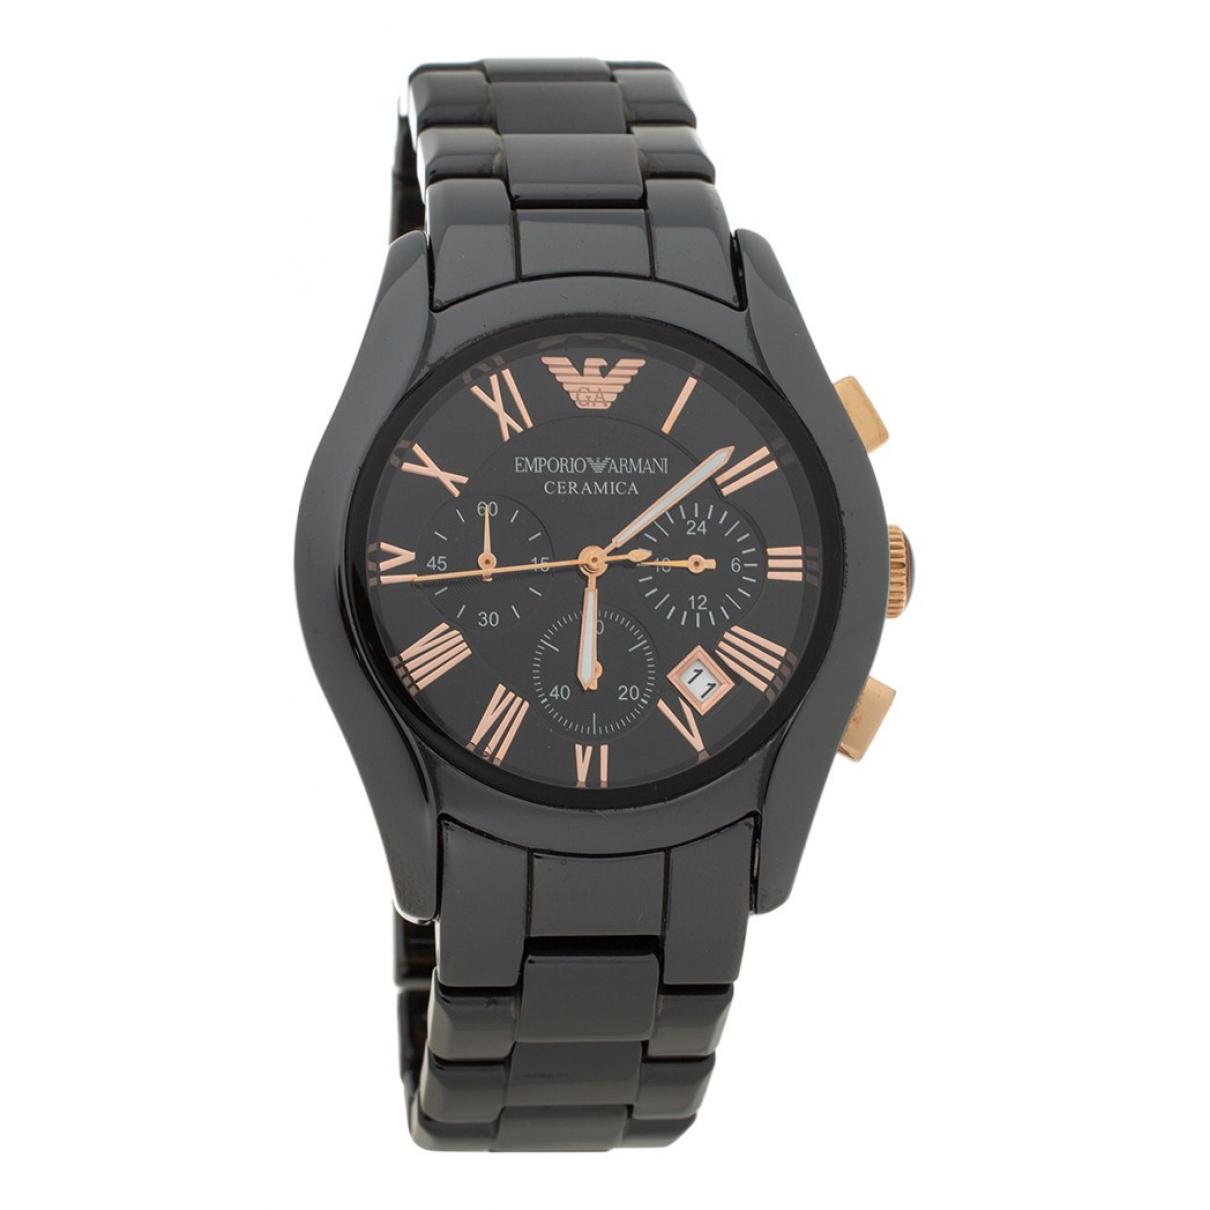 Emporio Armani N Black Ceramic watch for Men N